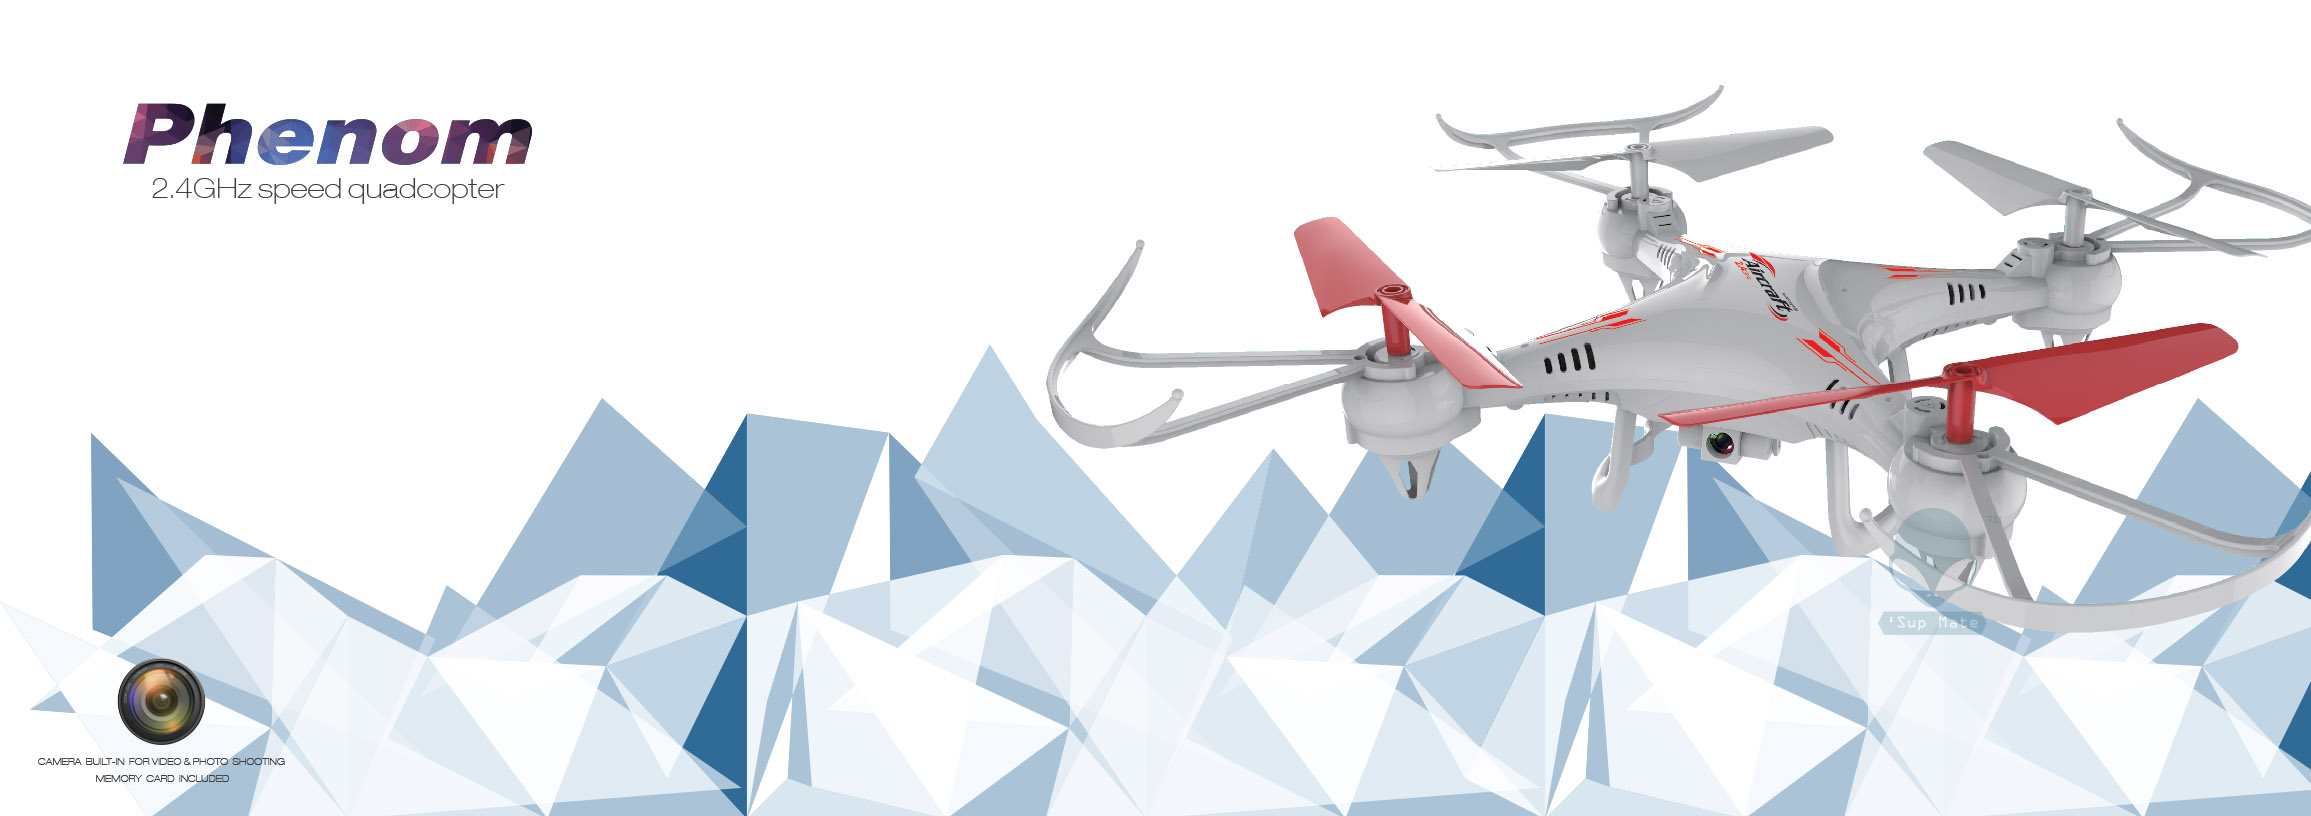 Phenom drone 01